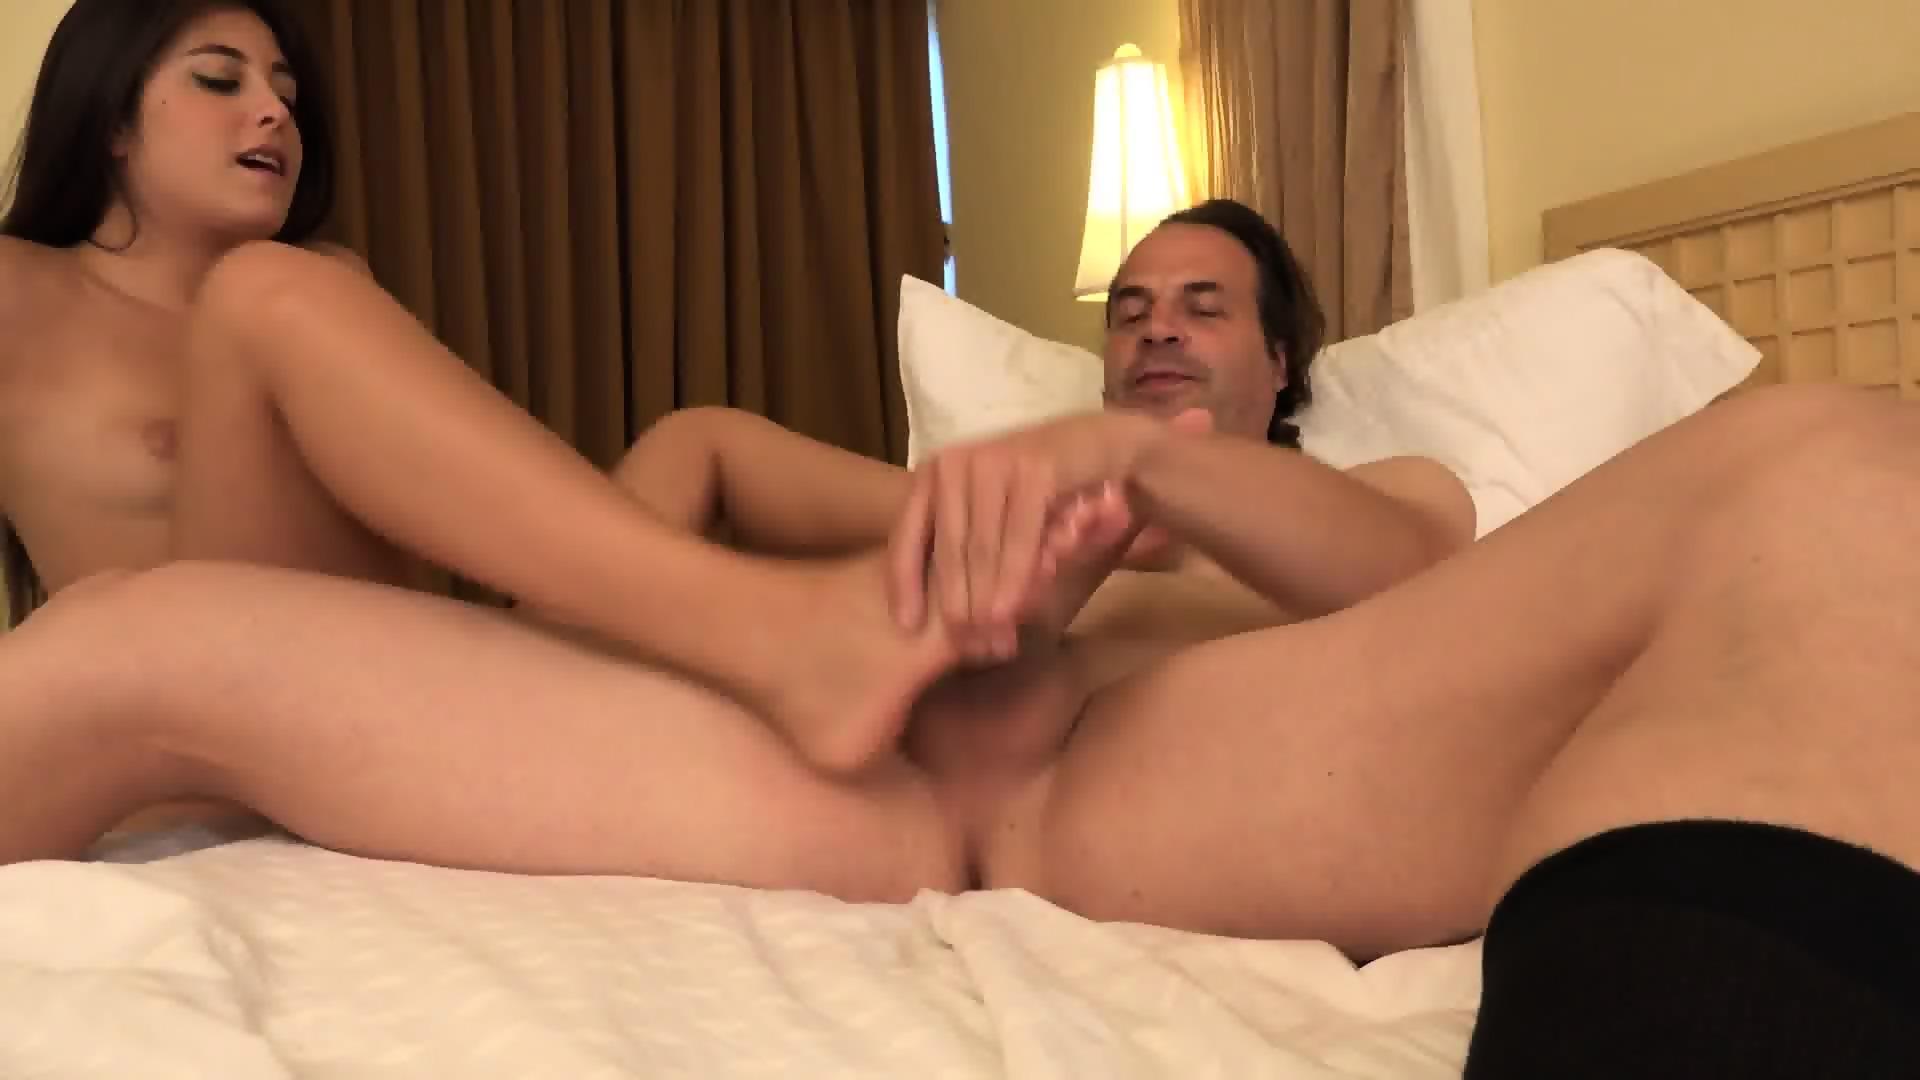 Dad fucks daughter and masturbation naturaltits